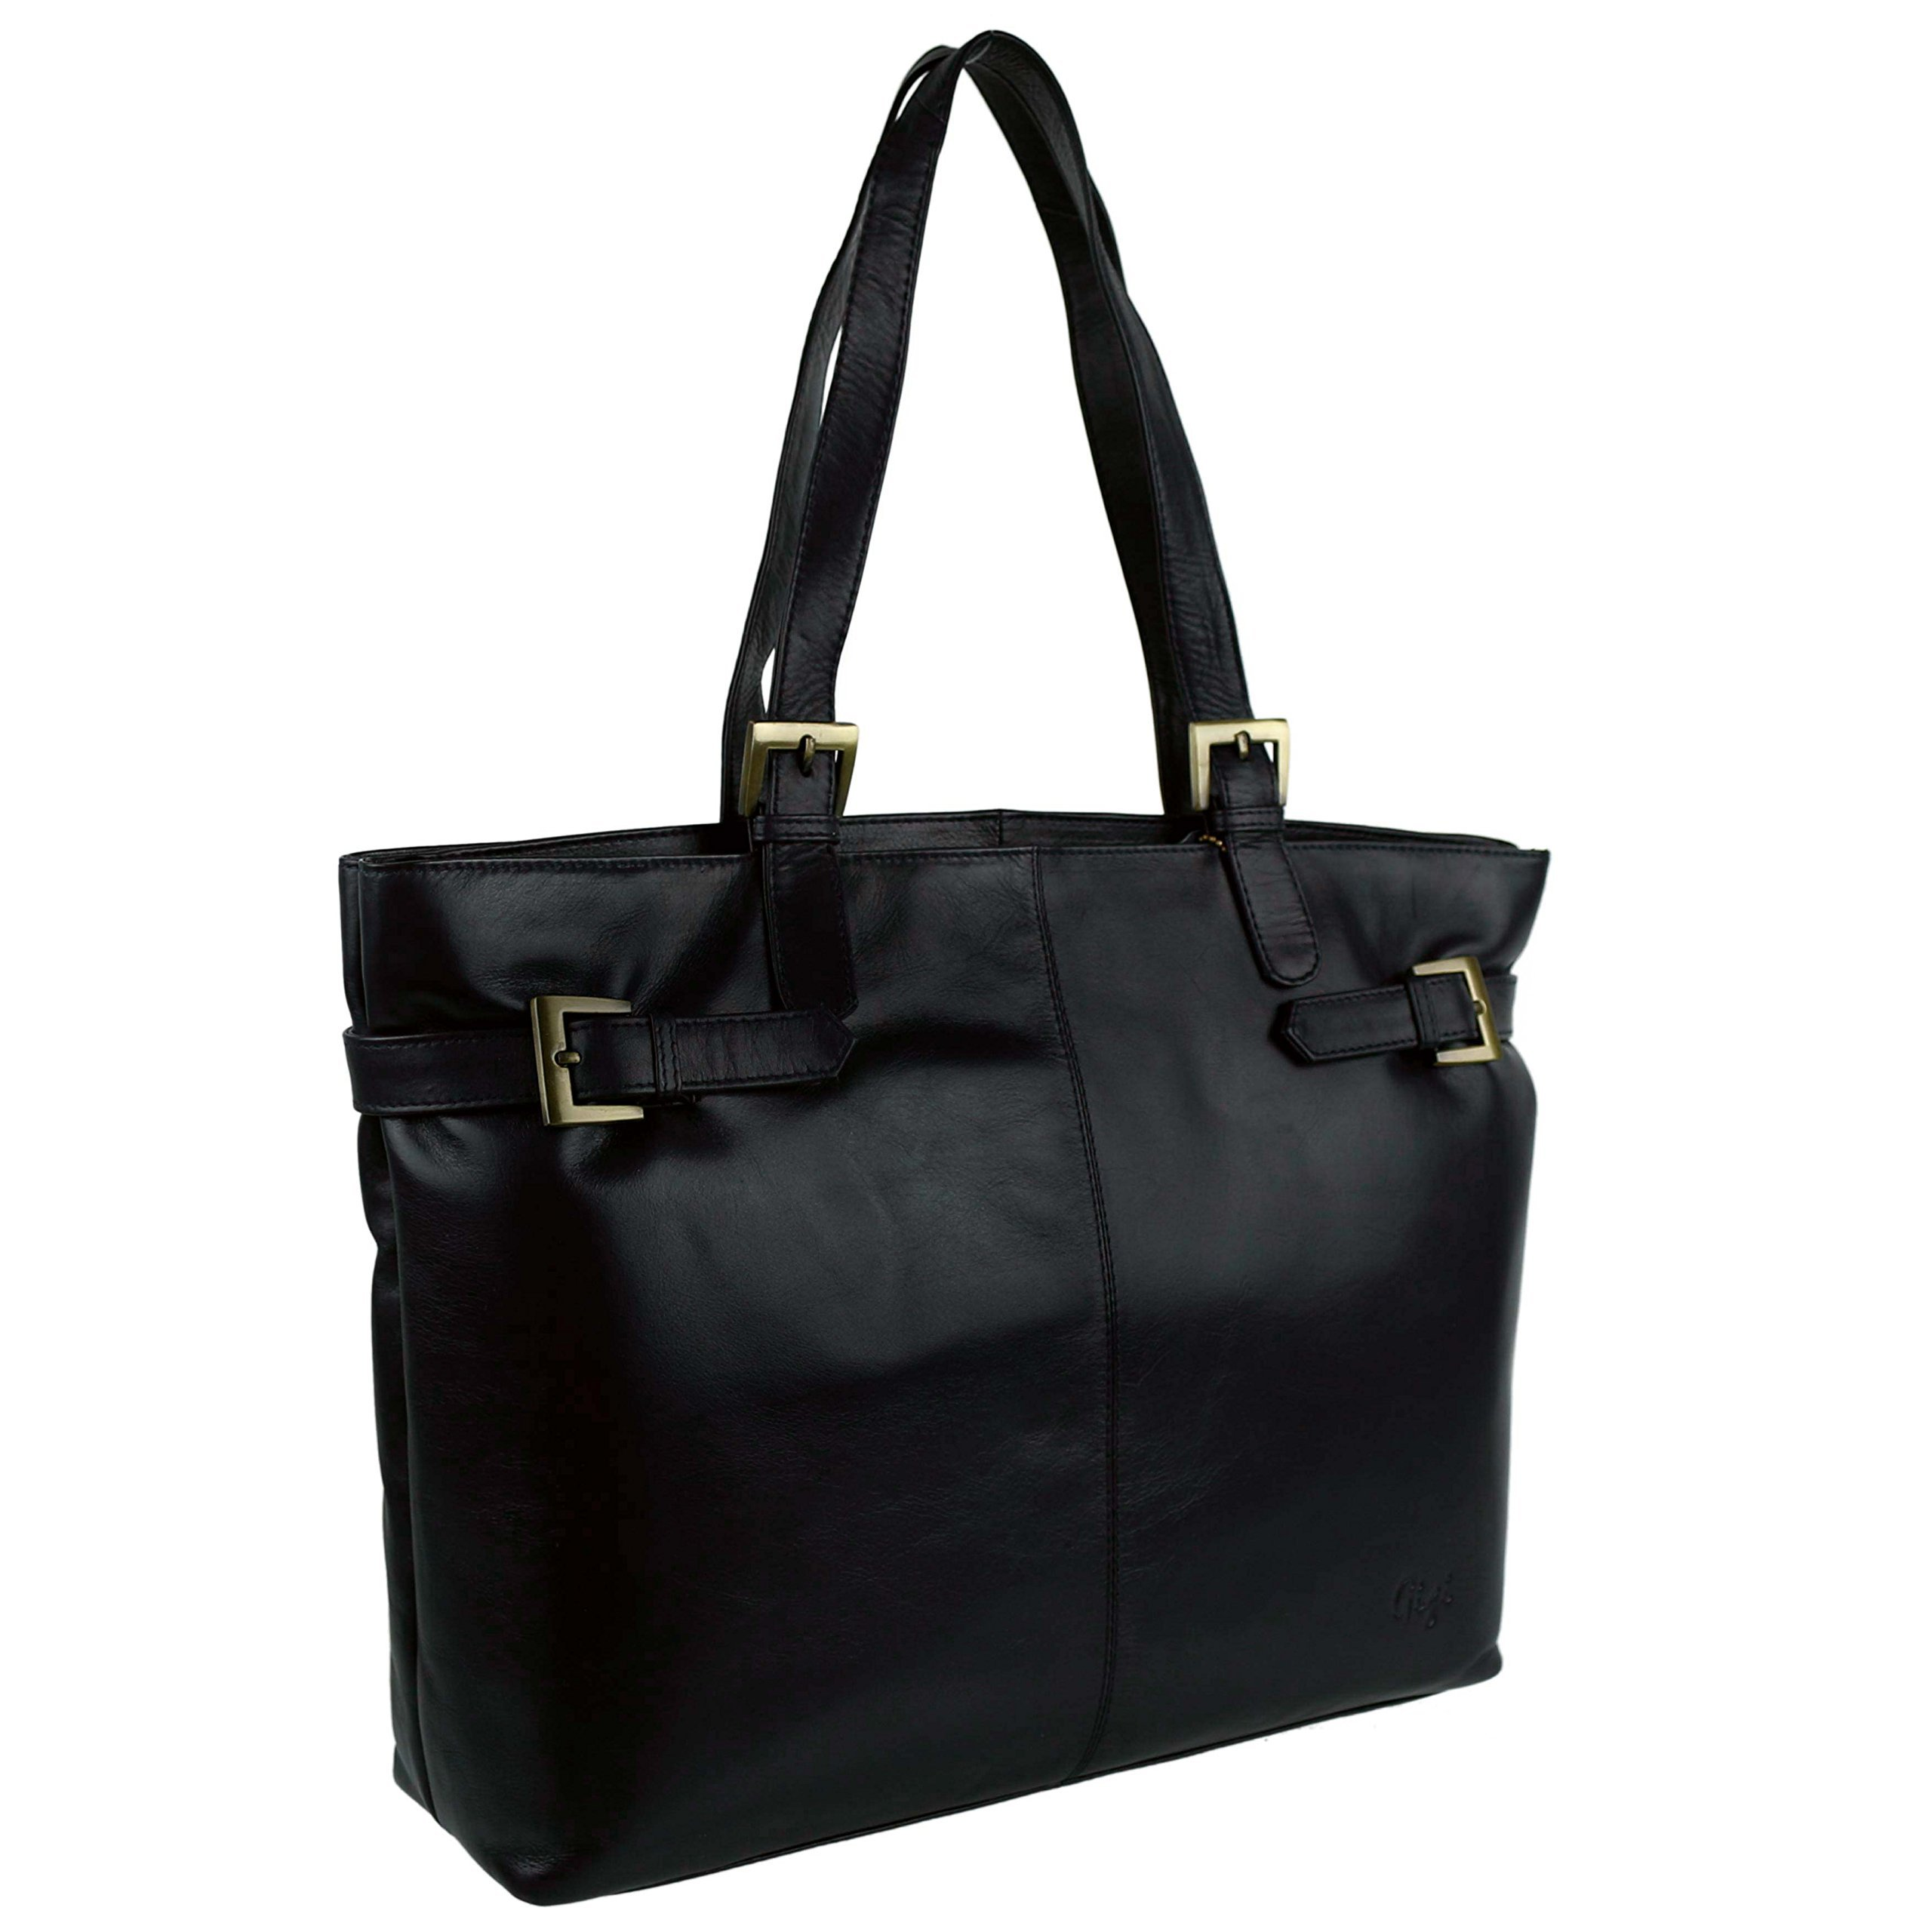 GIGI Women's Soft Leather Work Bag By Gigi Classic Navy Brown Handbag Large Black